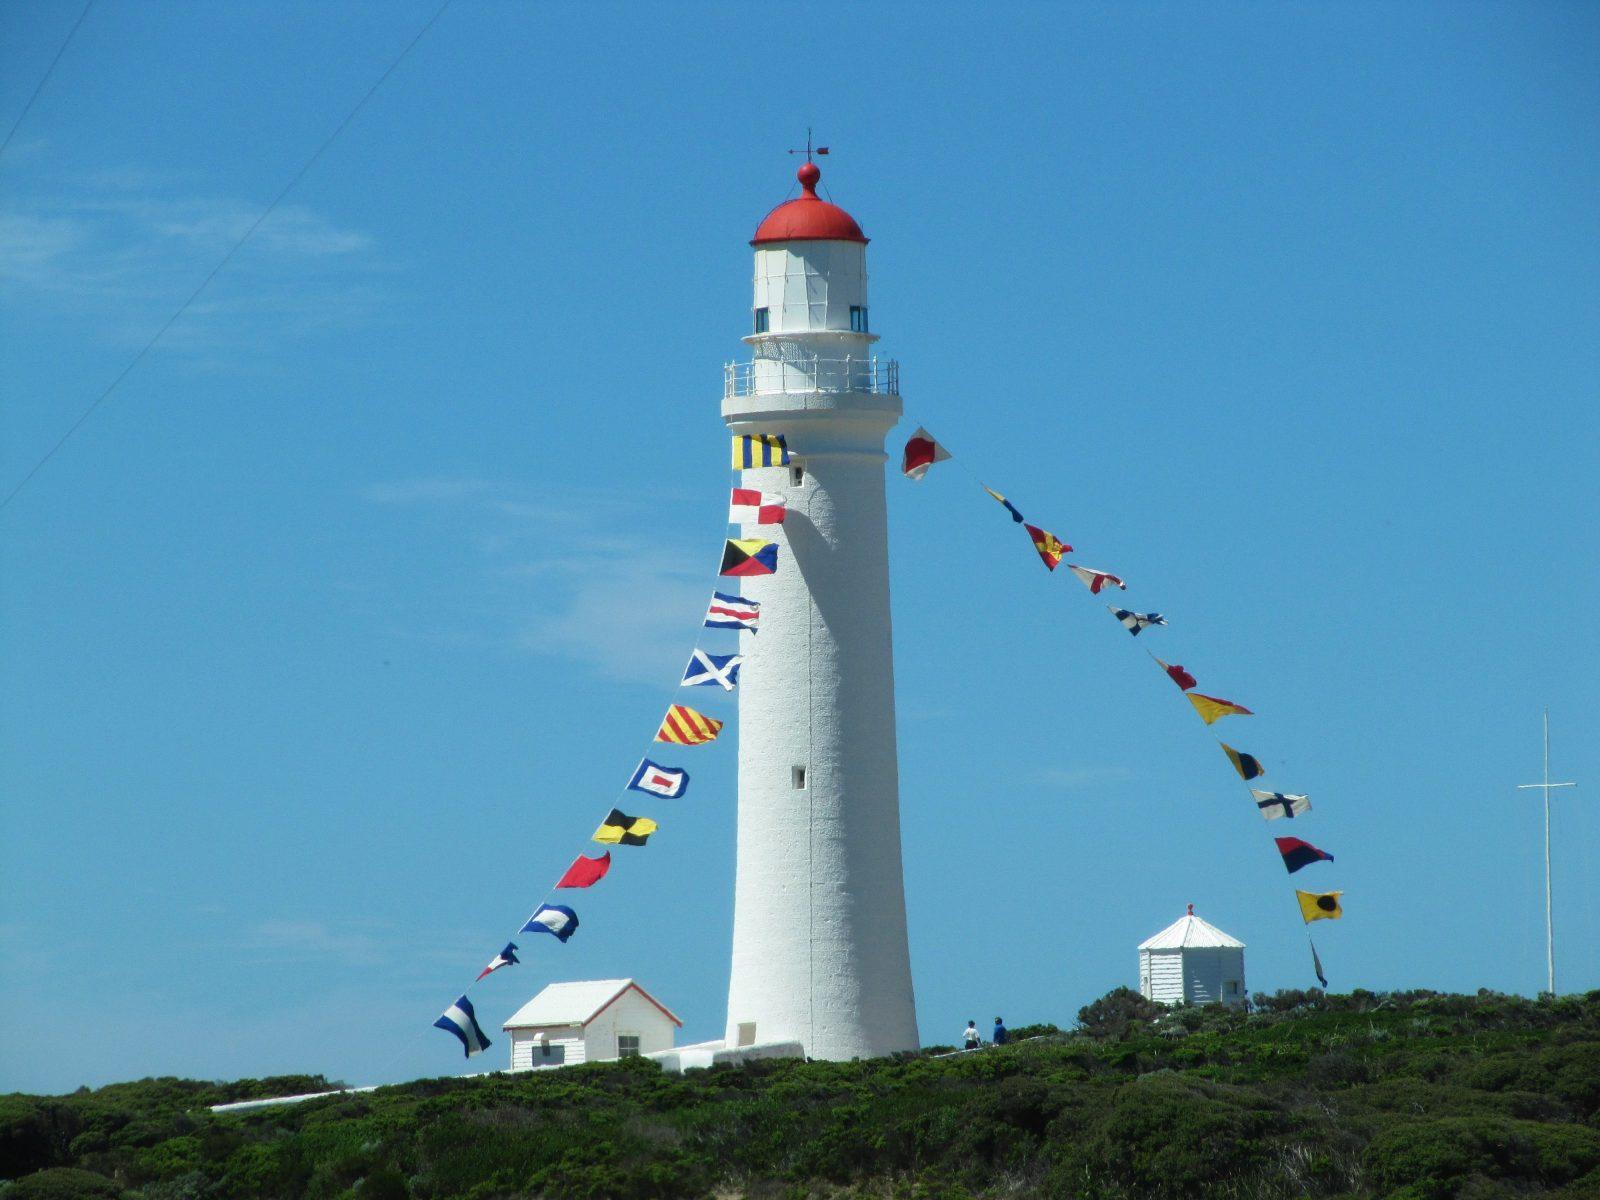 Najlepši svetionici sveta - Page 2 Cape-nelson-lighthouse-5de1ea5fc34fe56933646bf2-1600x1200